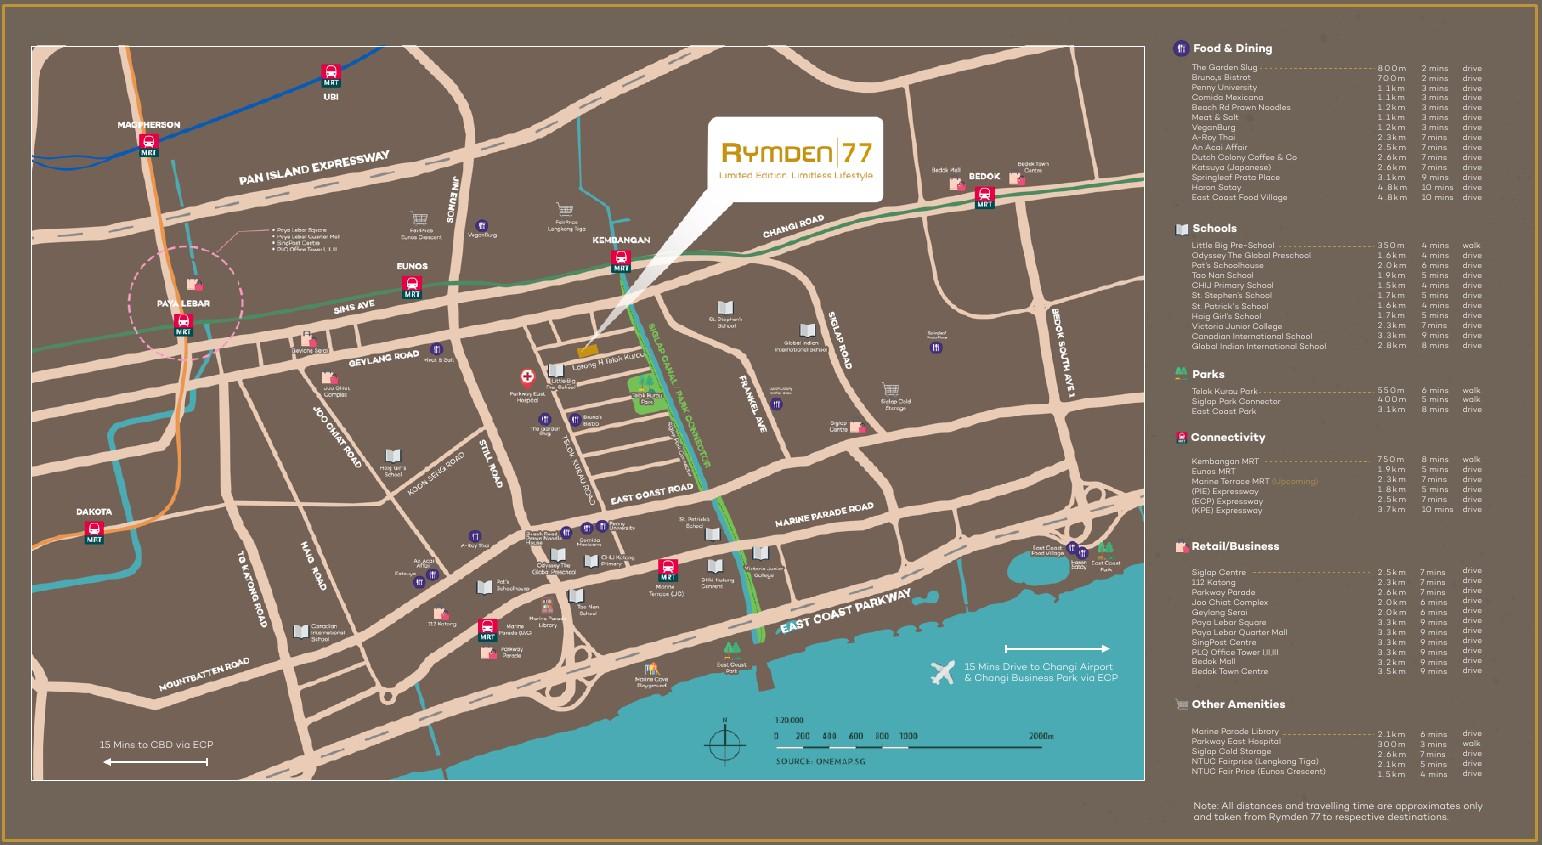 Rymden-77-new-condo-singapore-location-map